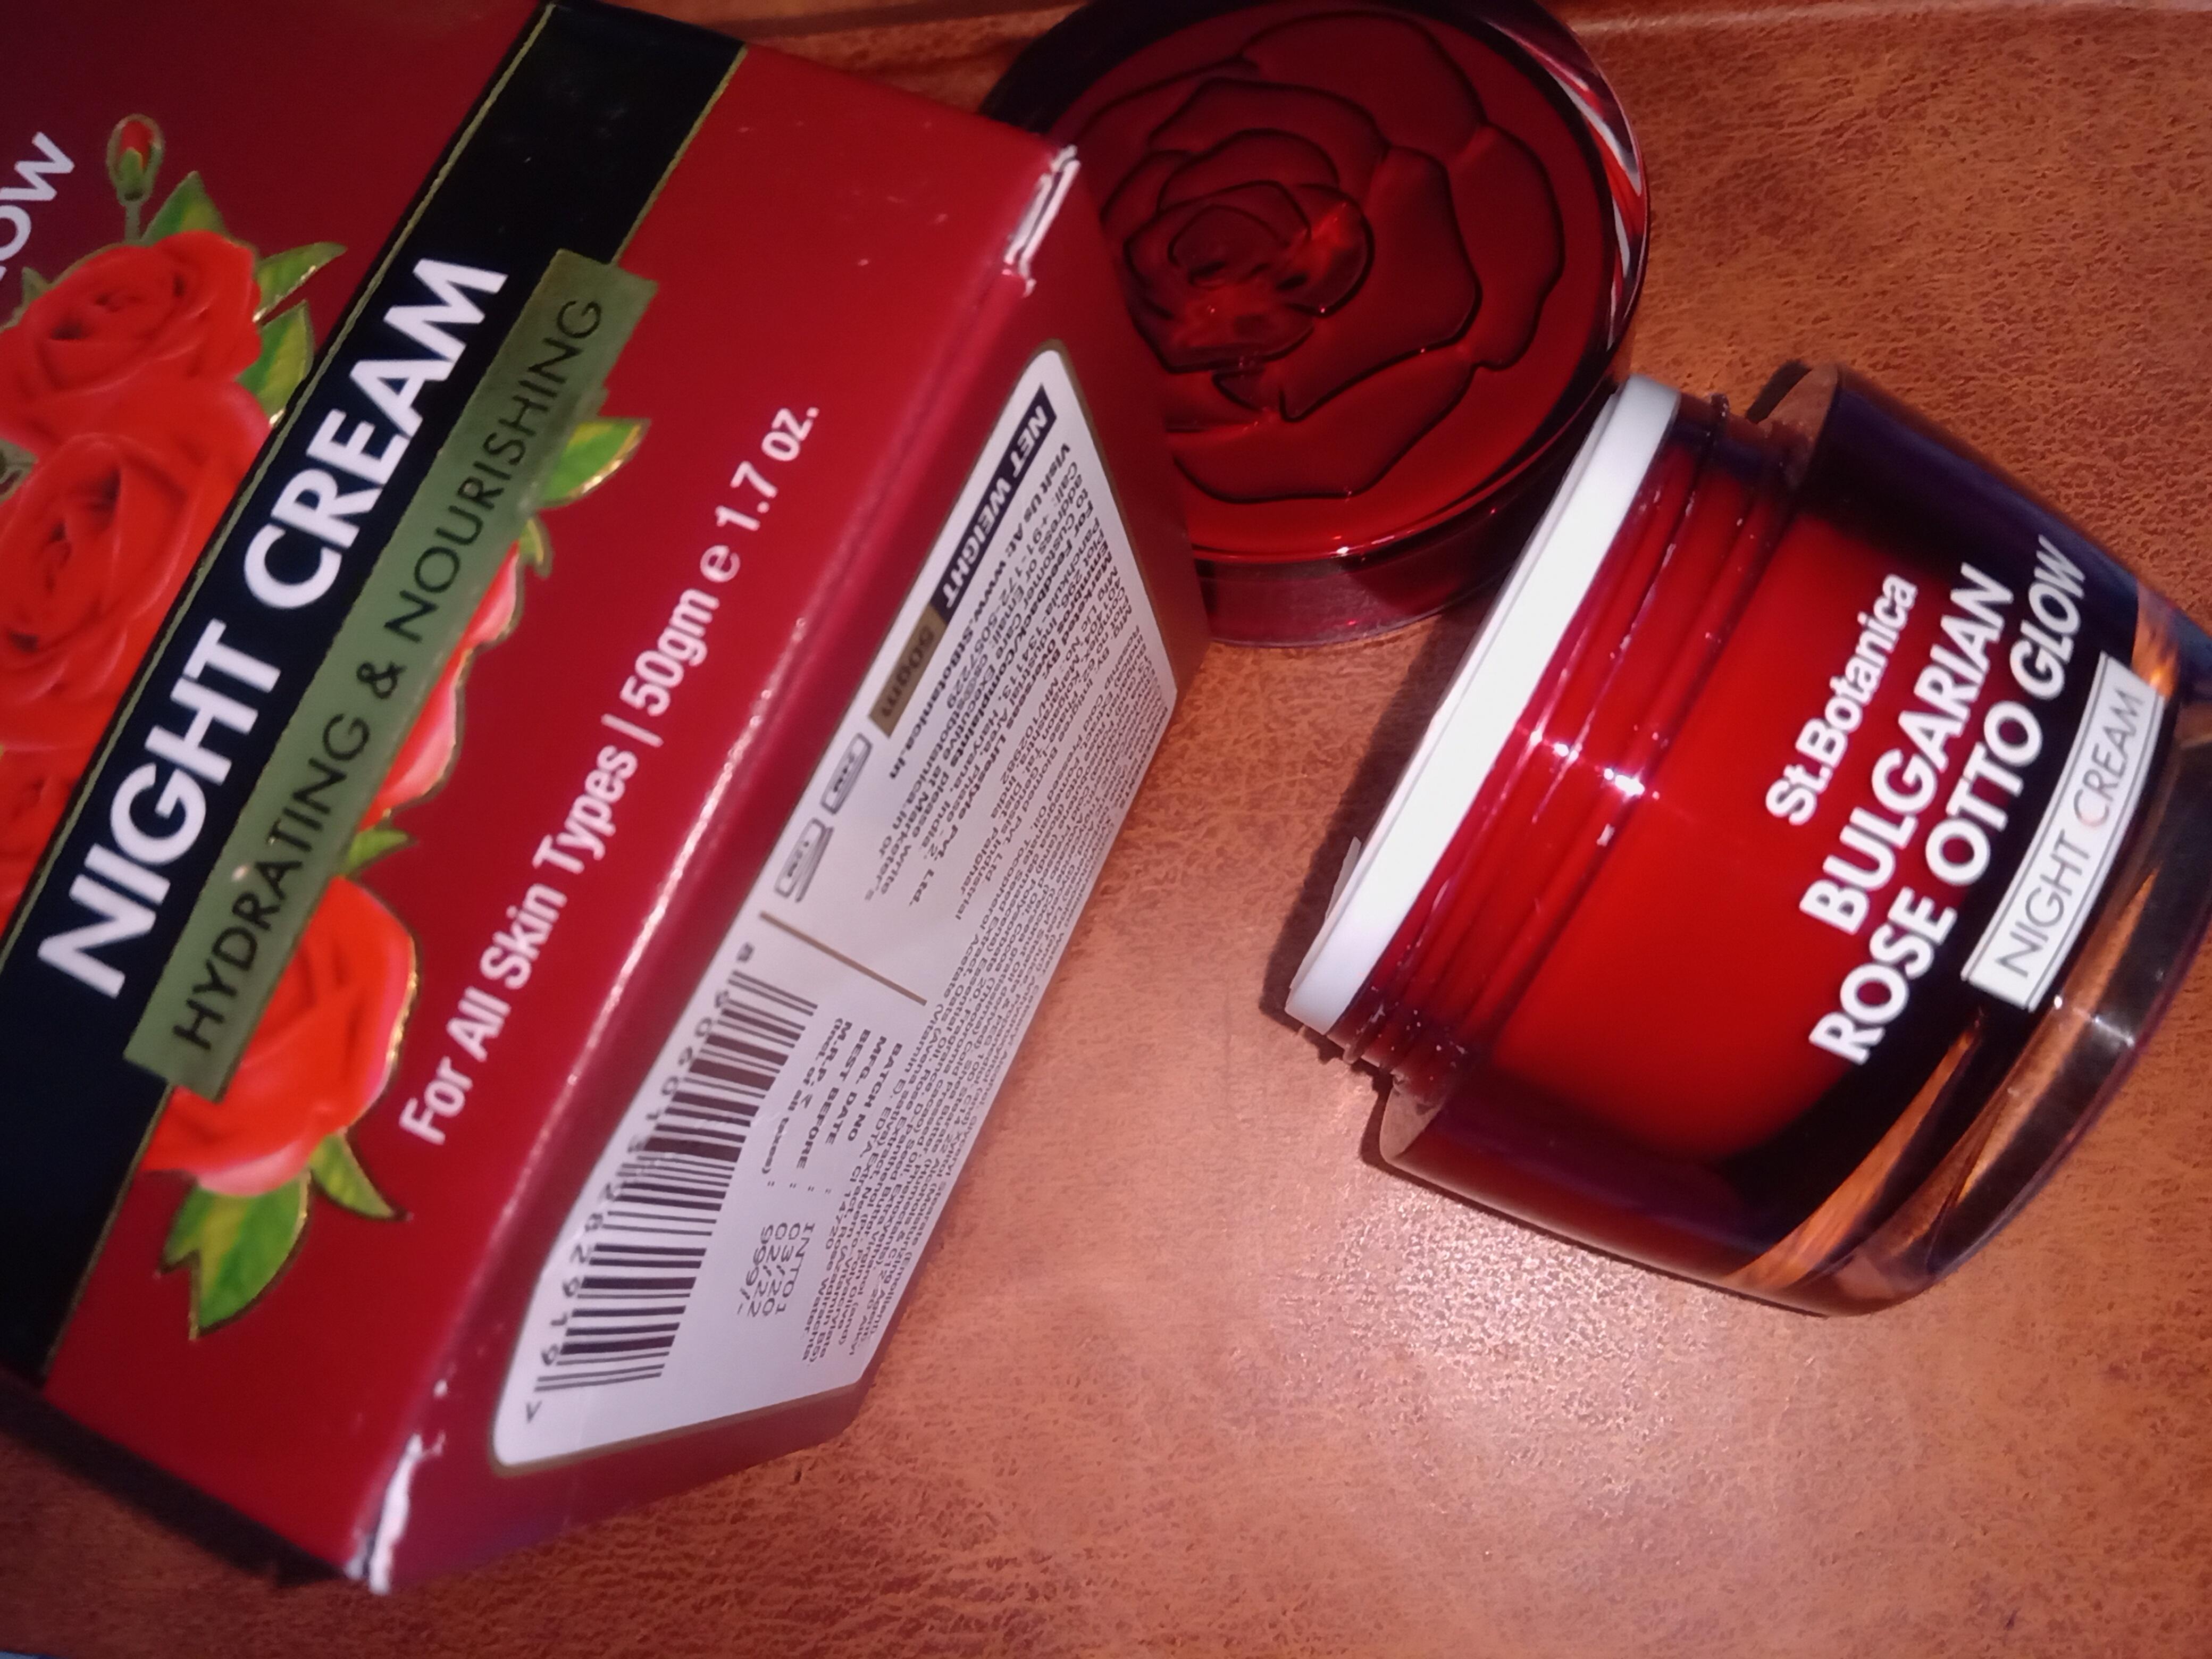 St.Botanica Bulgarian Rose Otto Glow Night Cream -Effective night cream-By miss_mohinto